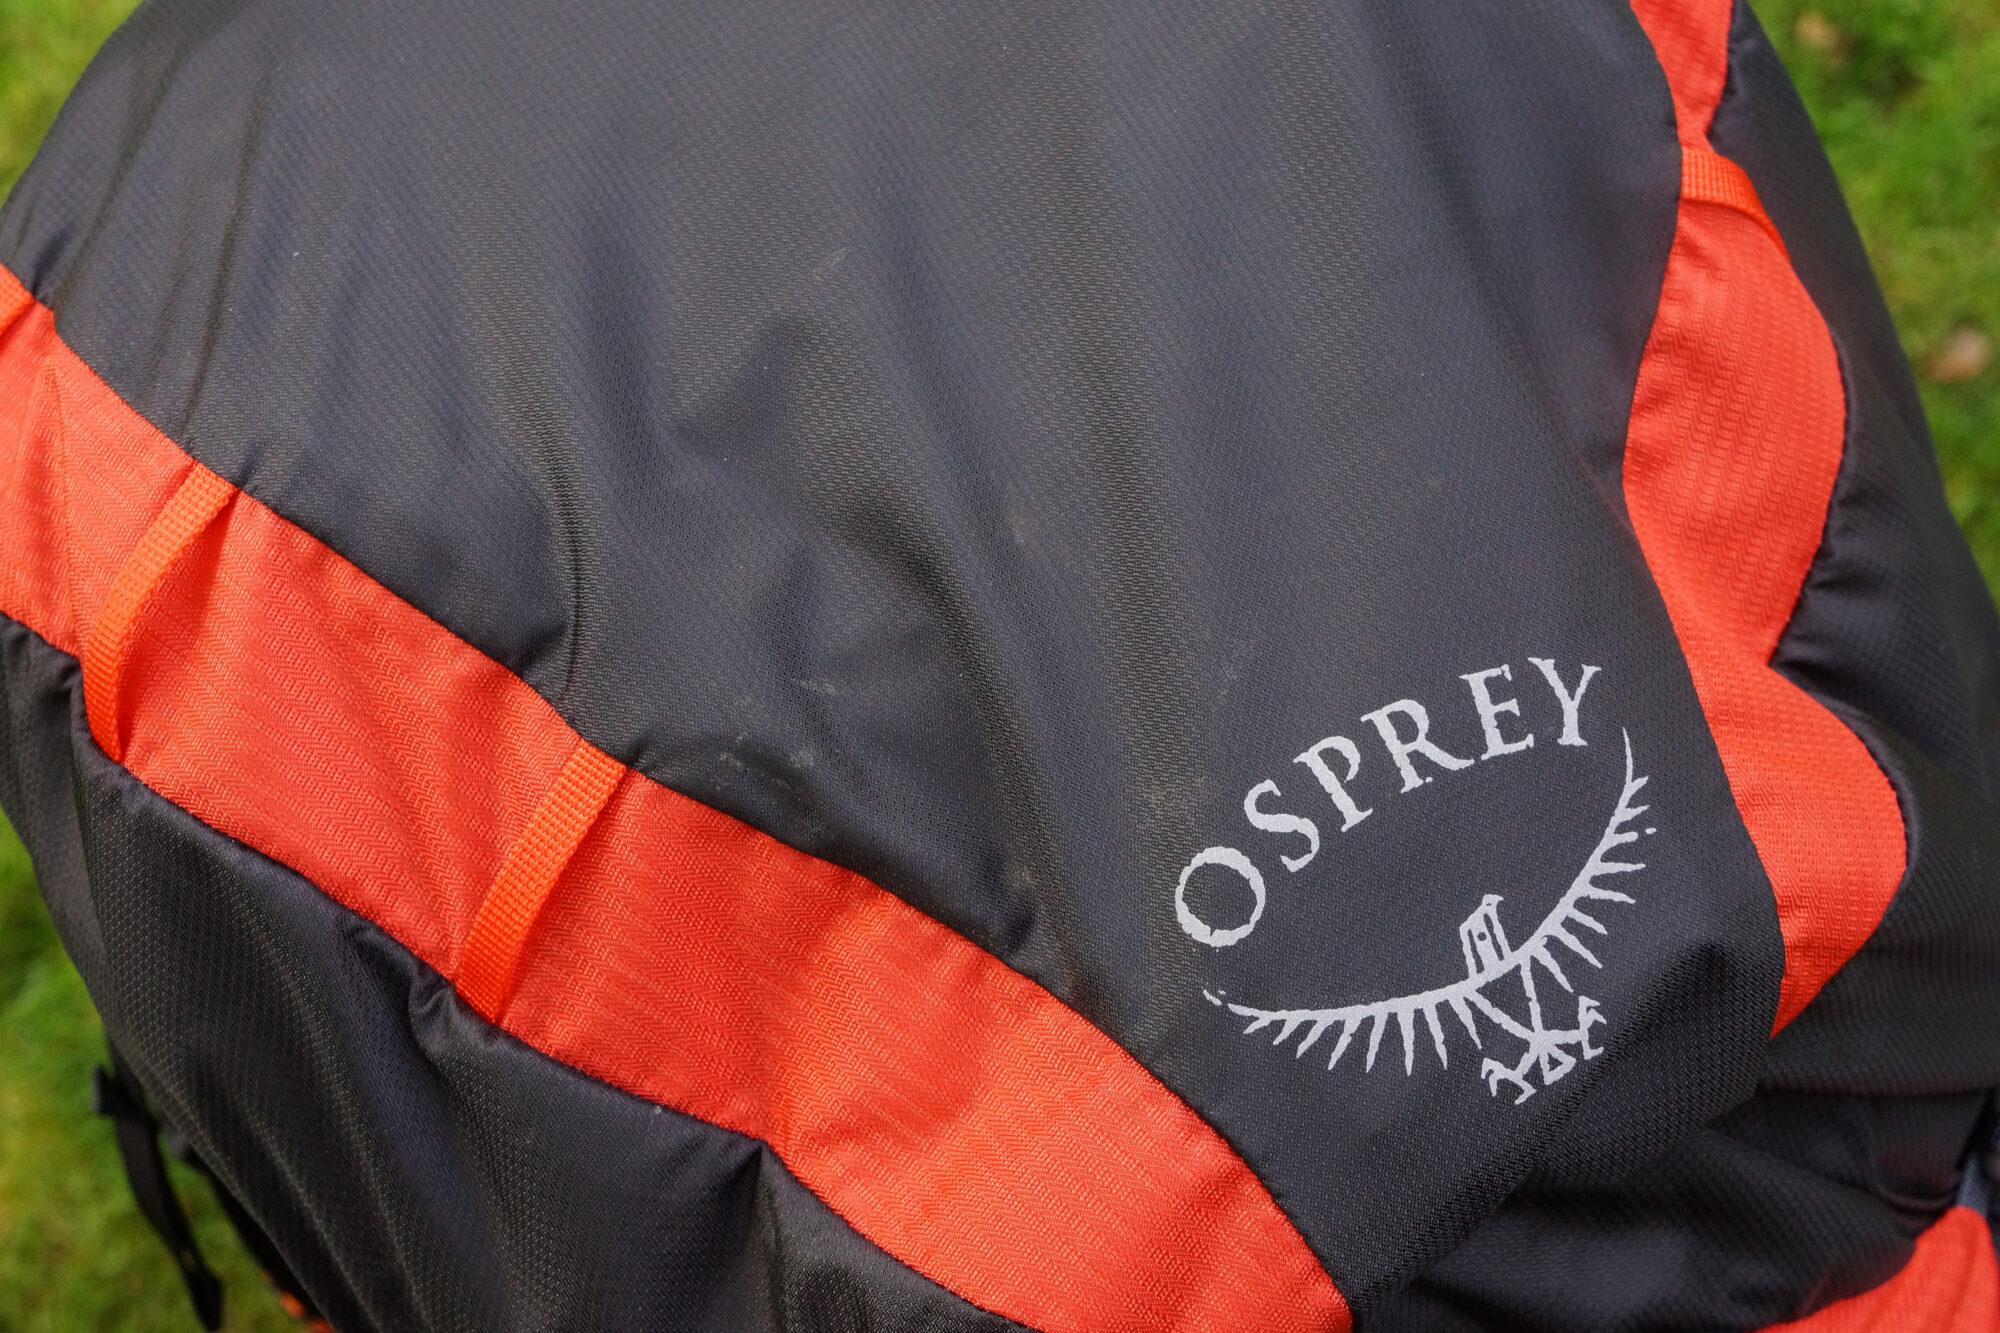 Review van de Osprey Exos 58 topvak